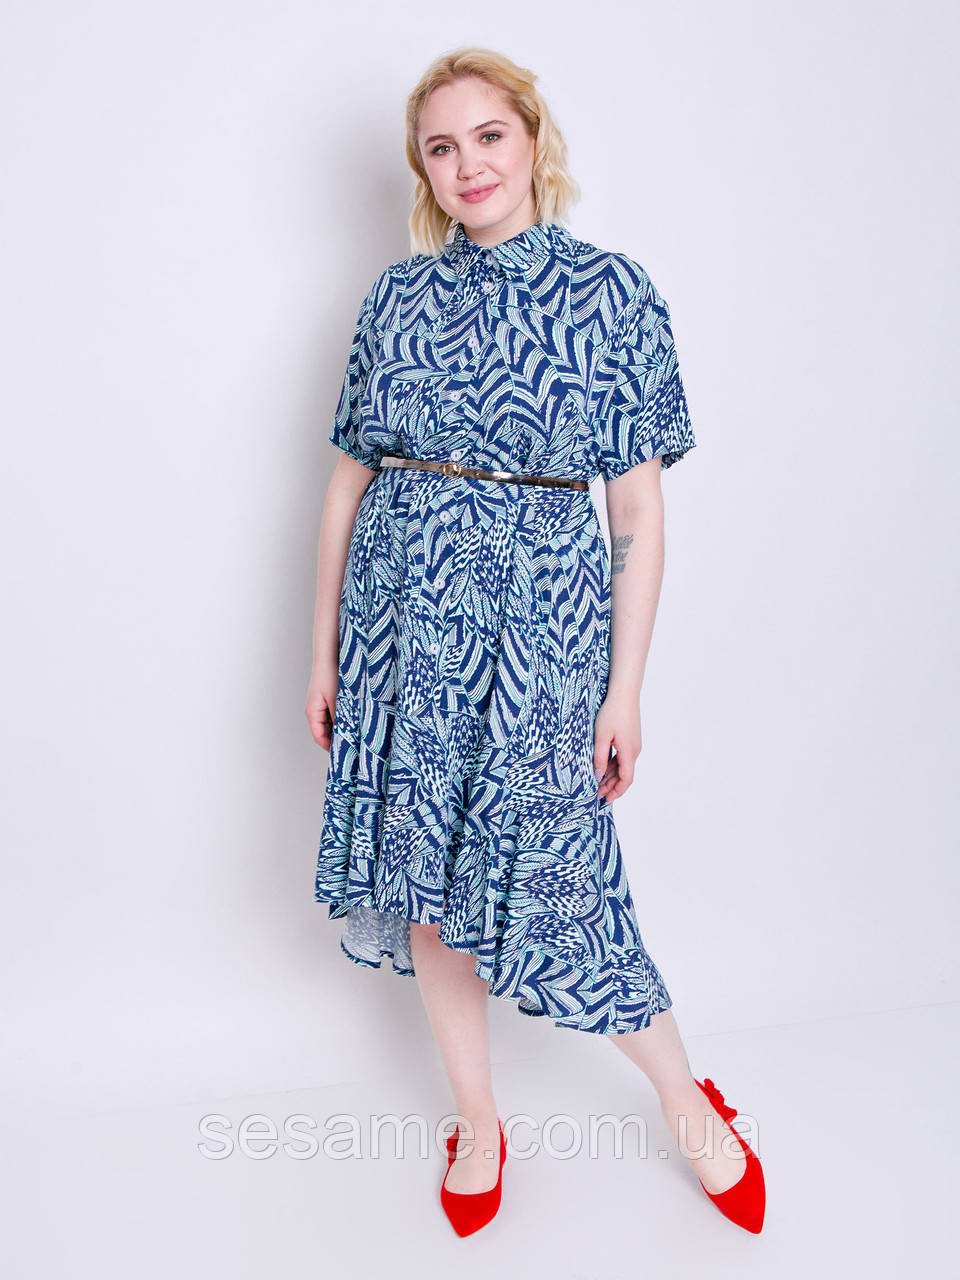 grand ua Мэделин принт платье